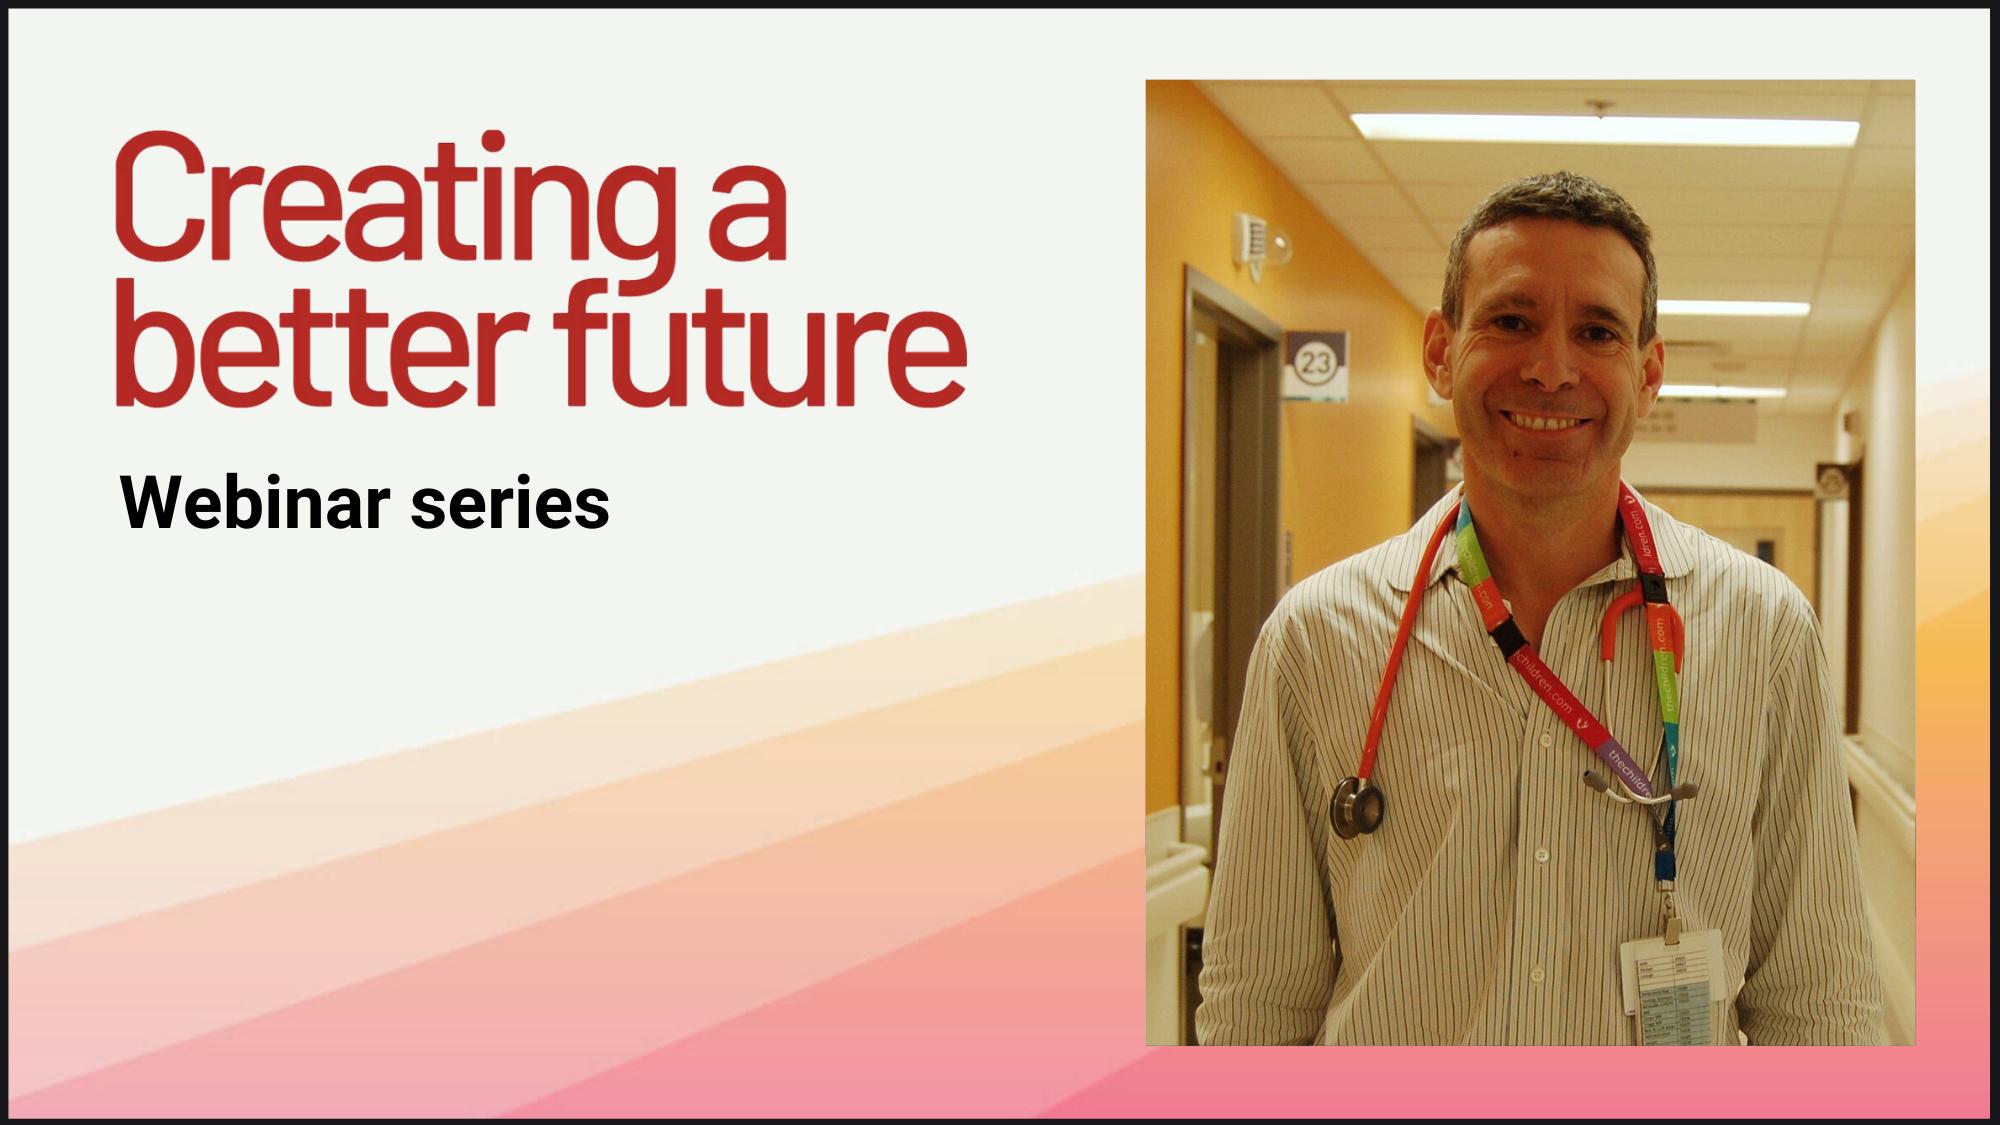 Webinar series with Dr. Ben-Shoshan